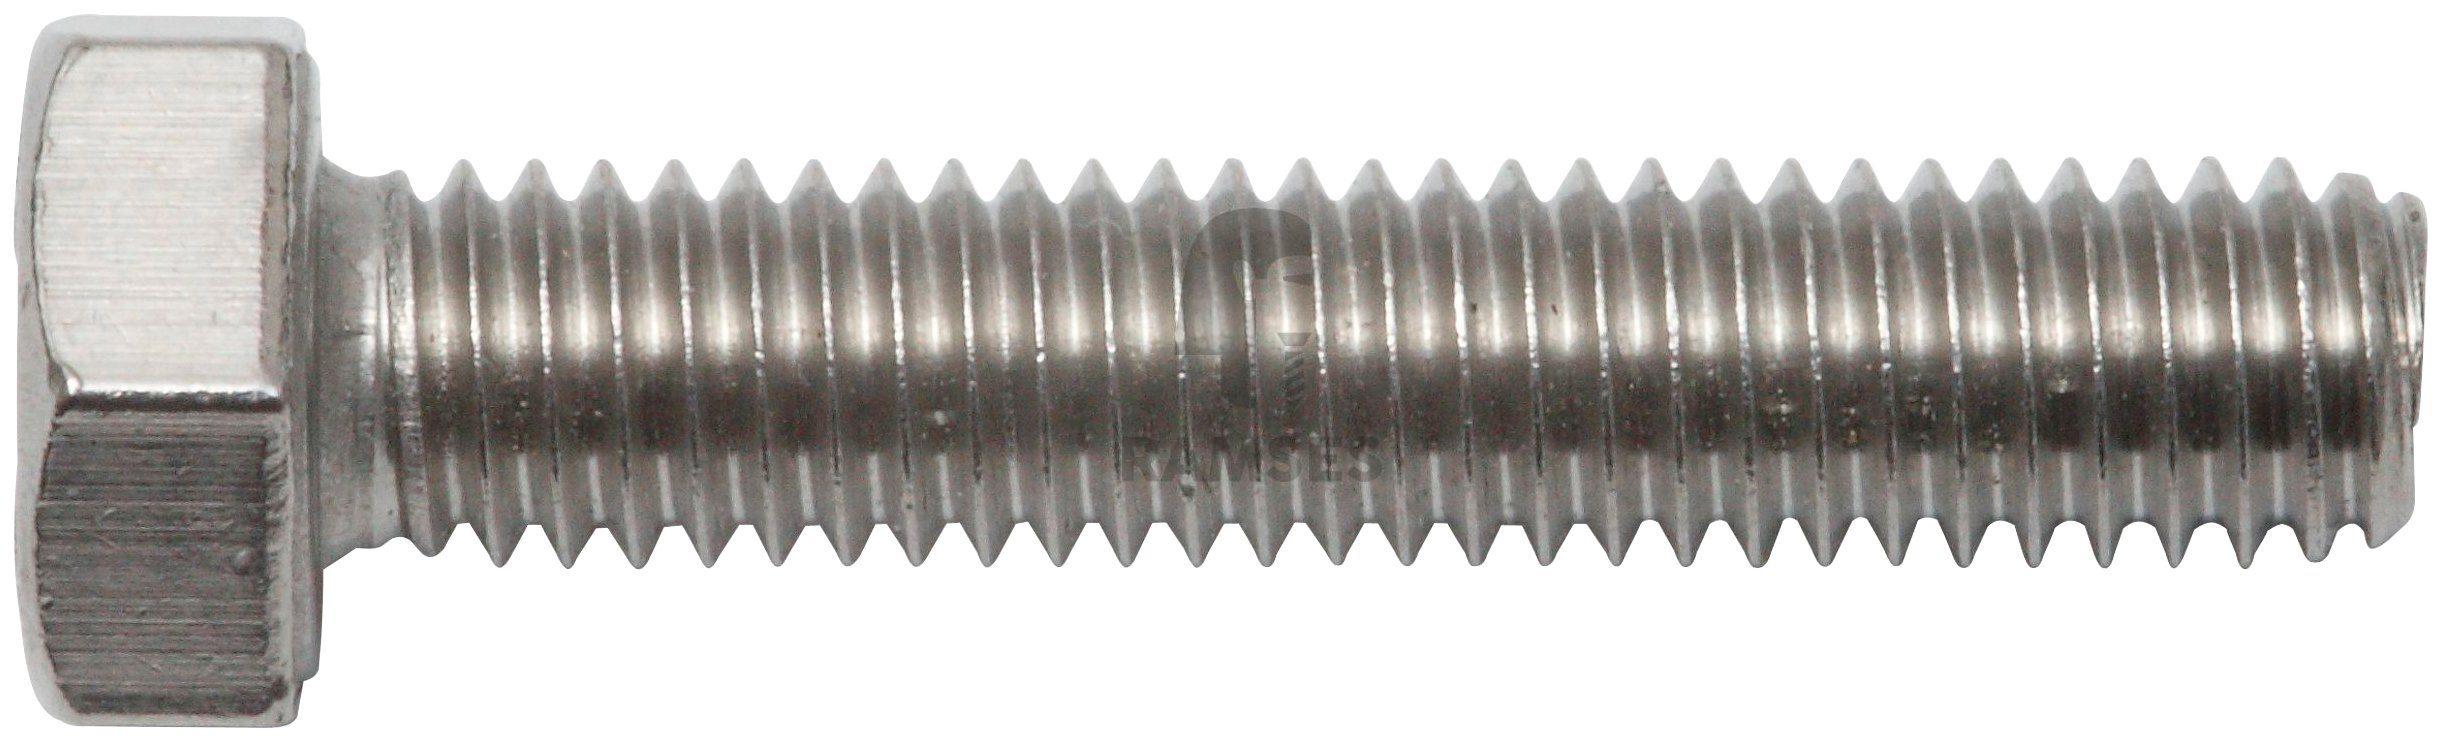 RAMSES Schrauben , Sechskantschraube M12 x 60 mm 15 Stk.